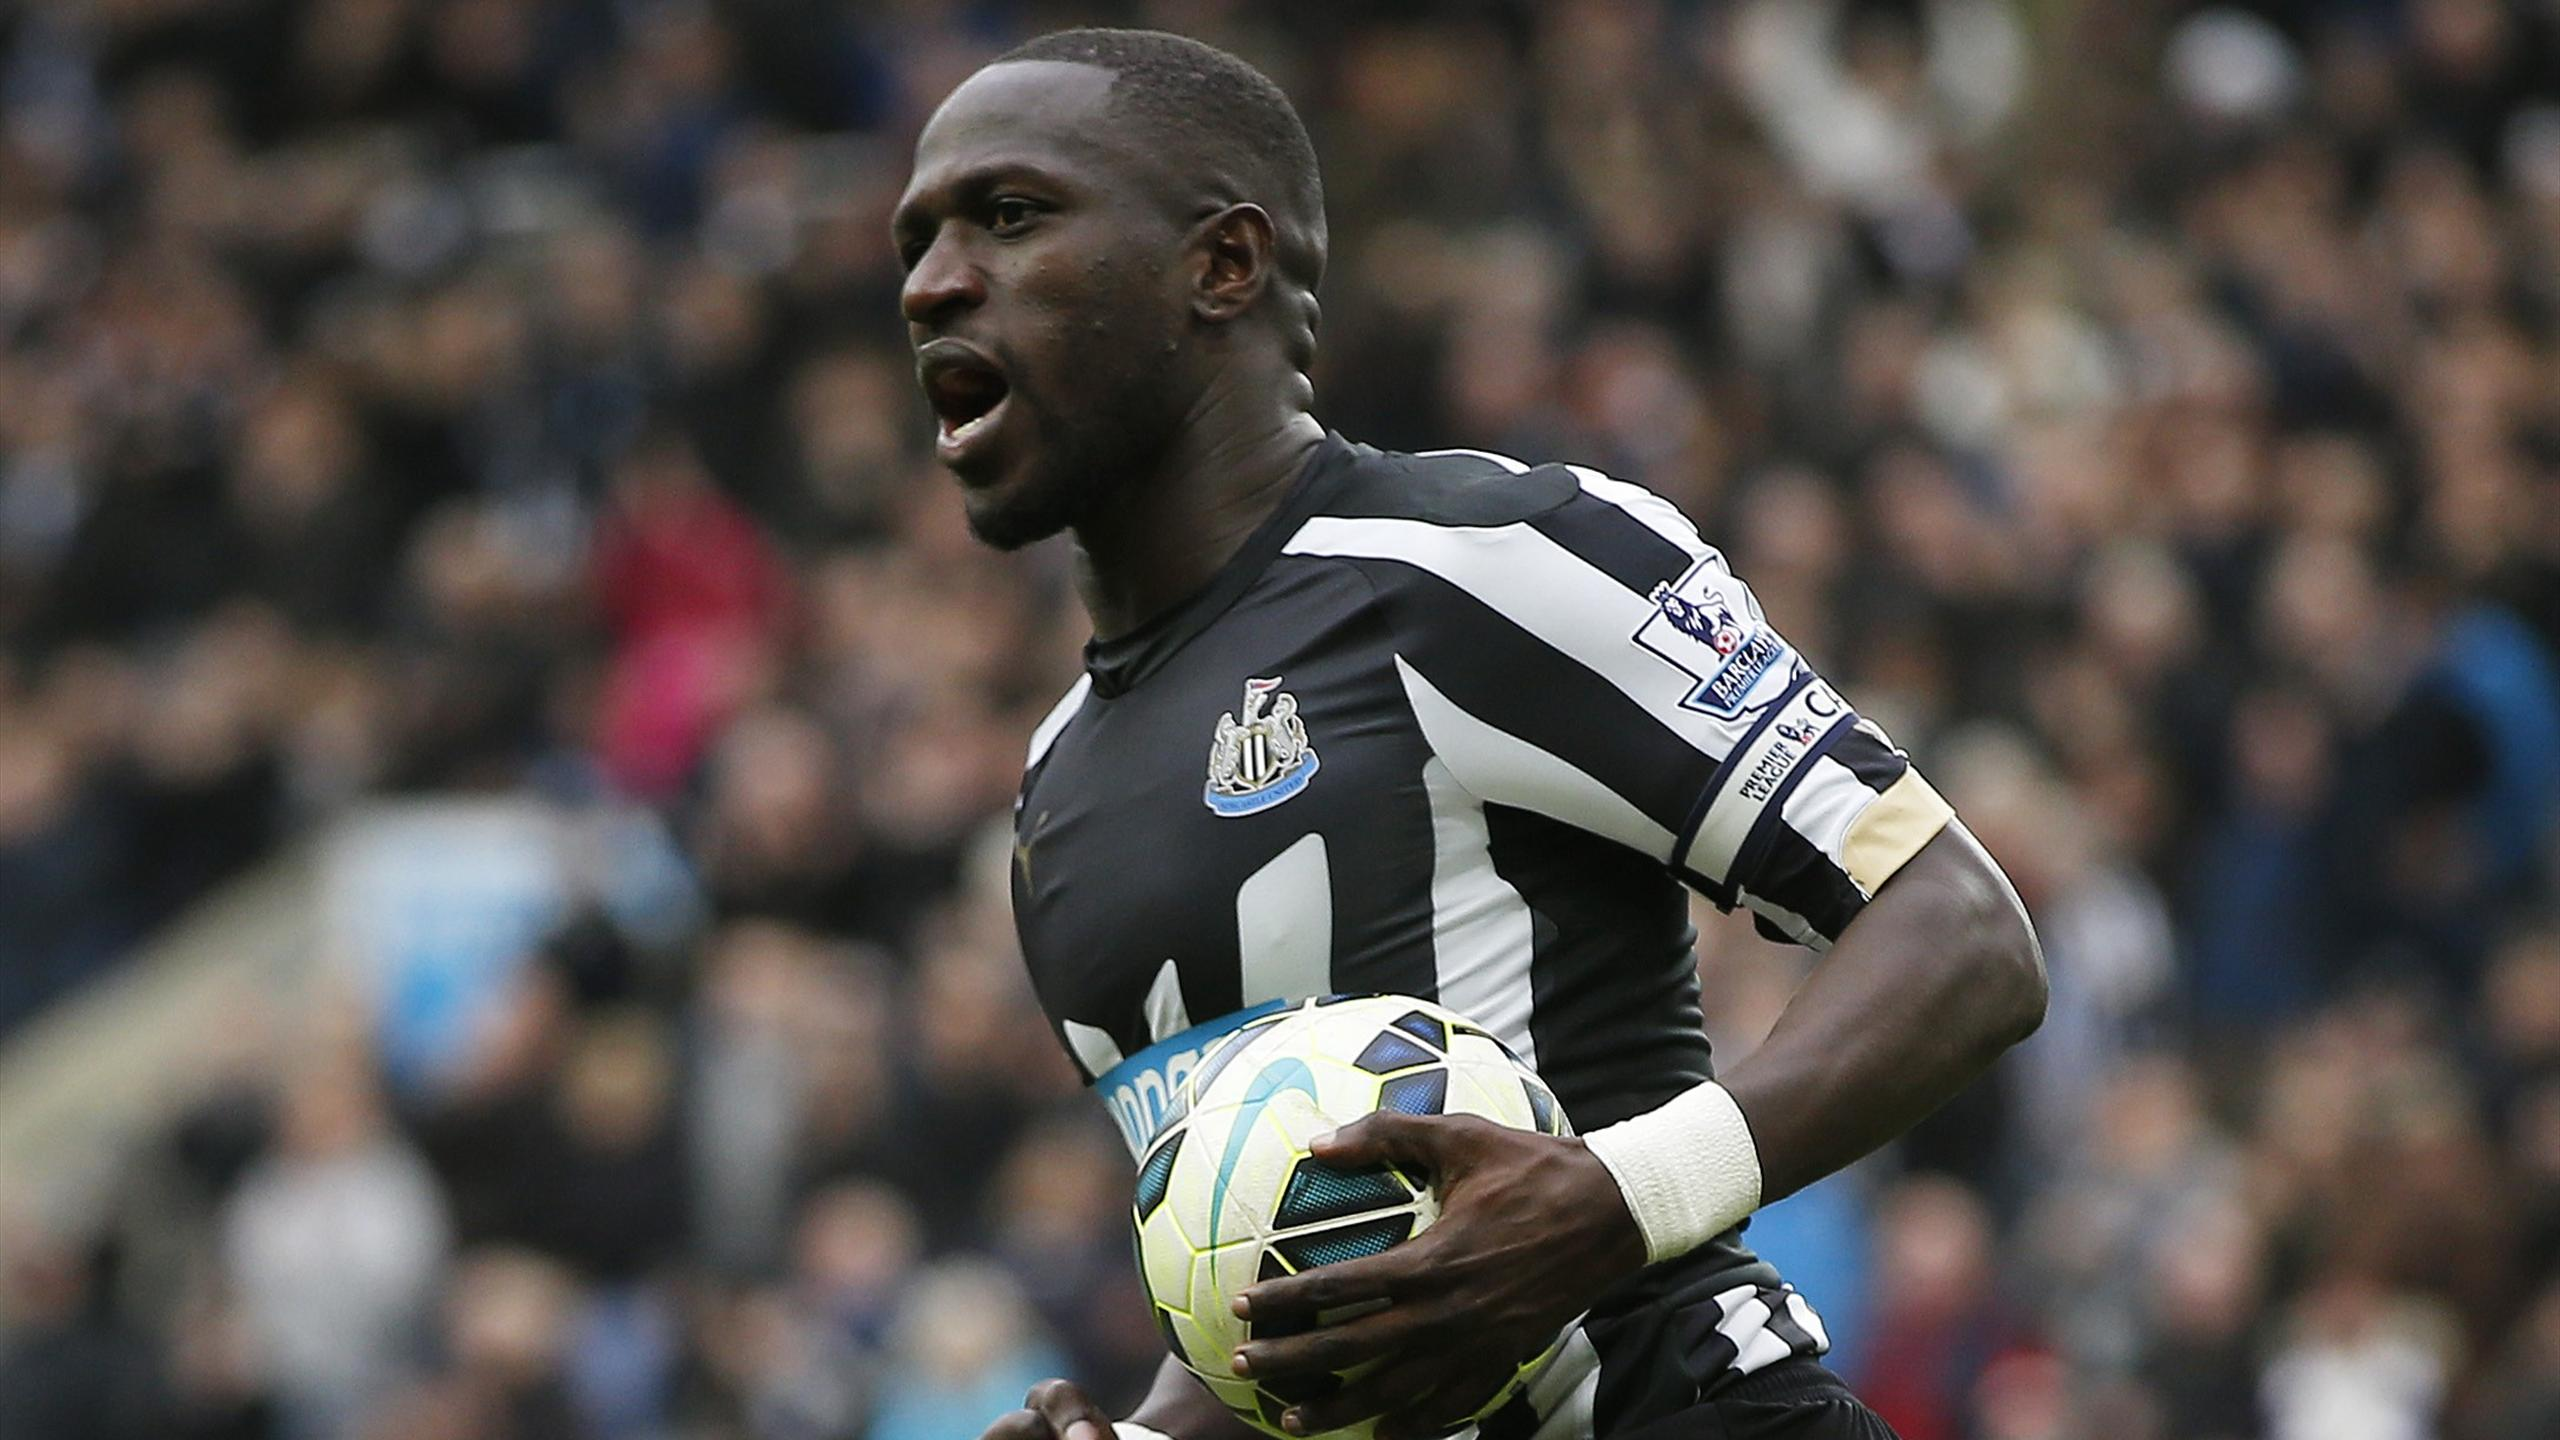 Maillot Domicile Tottenham Hotspur Moussa Sissoko